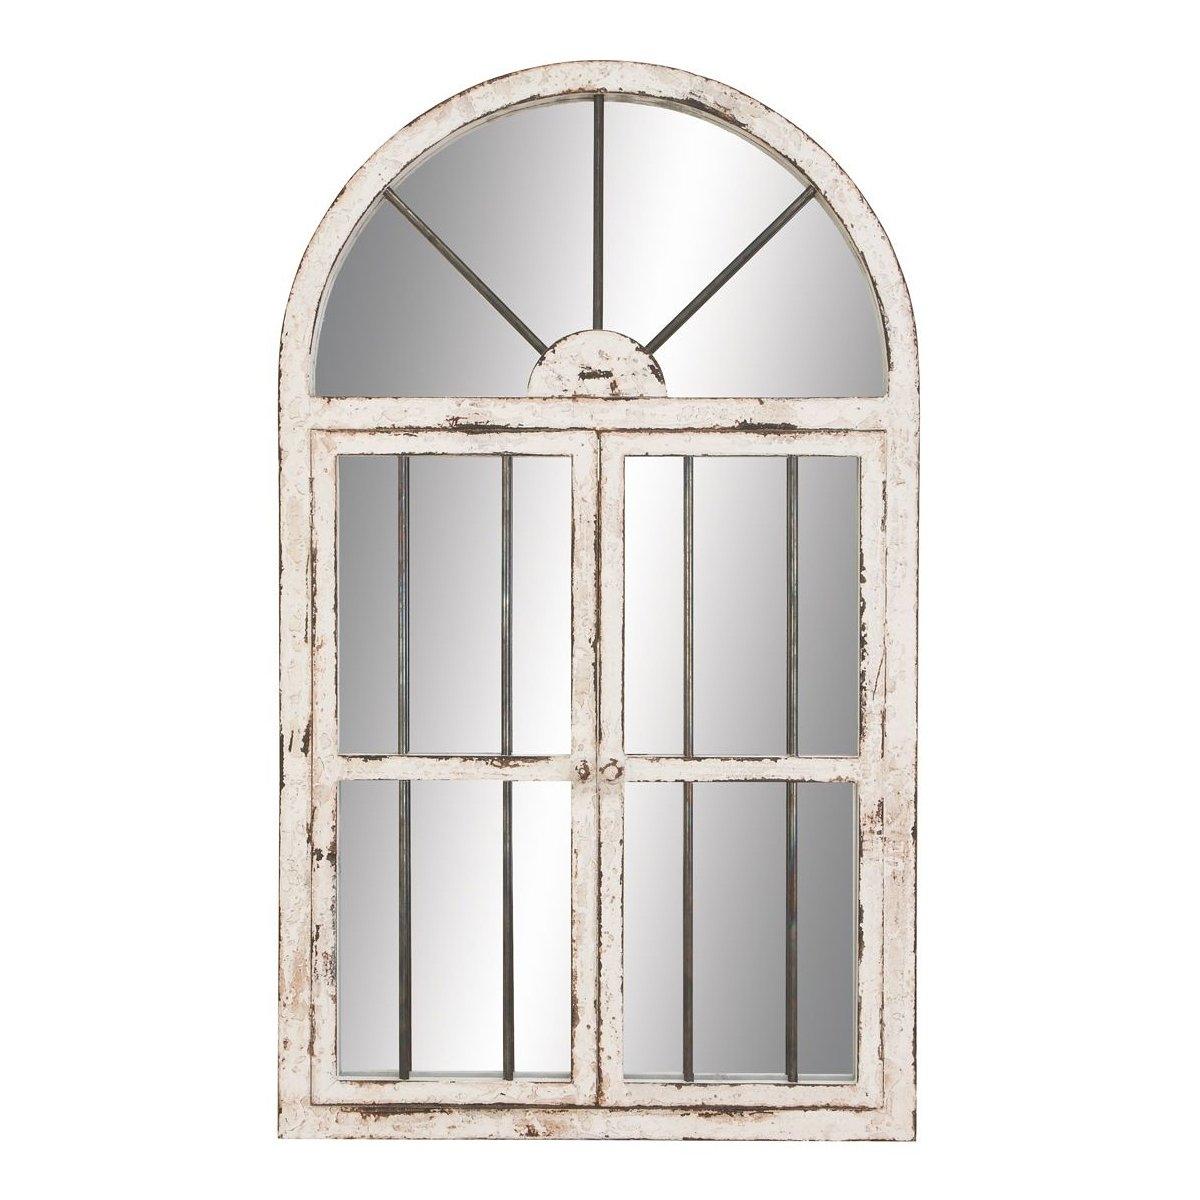 Aspire Window Wall Mirror Aspire Window Wall Mirror aspire home accents 74397 42 in arched window wall mirror 1200 X 1200